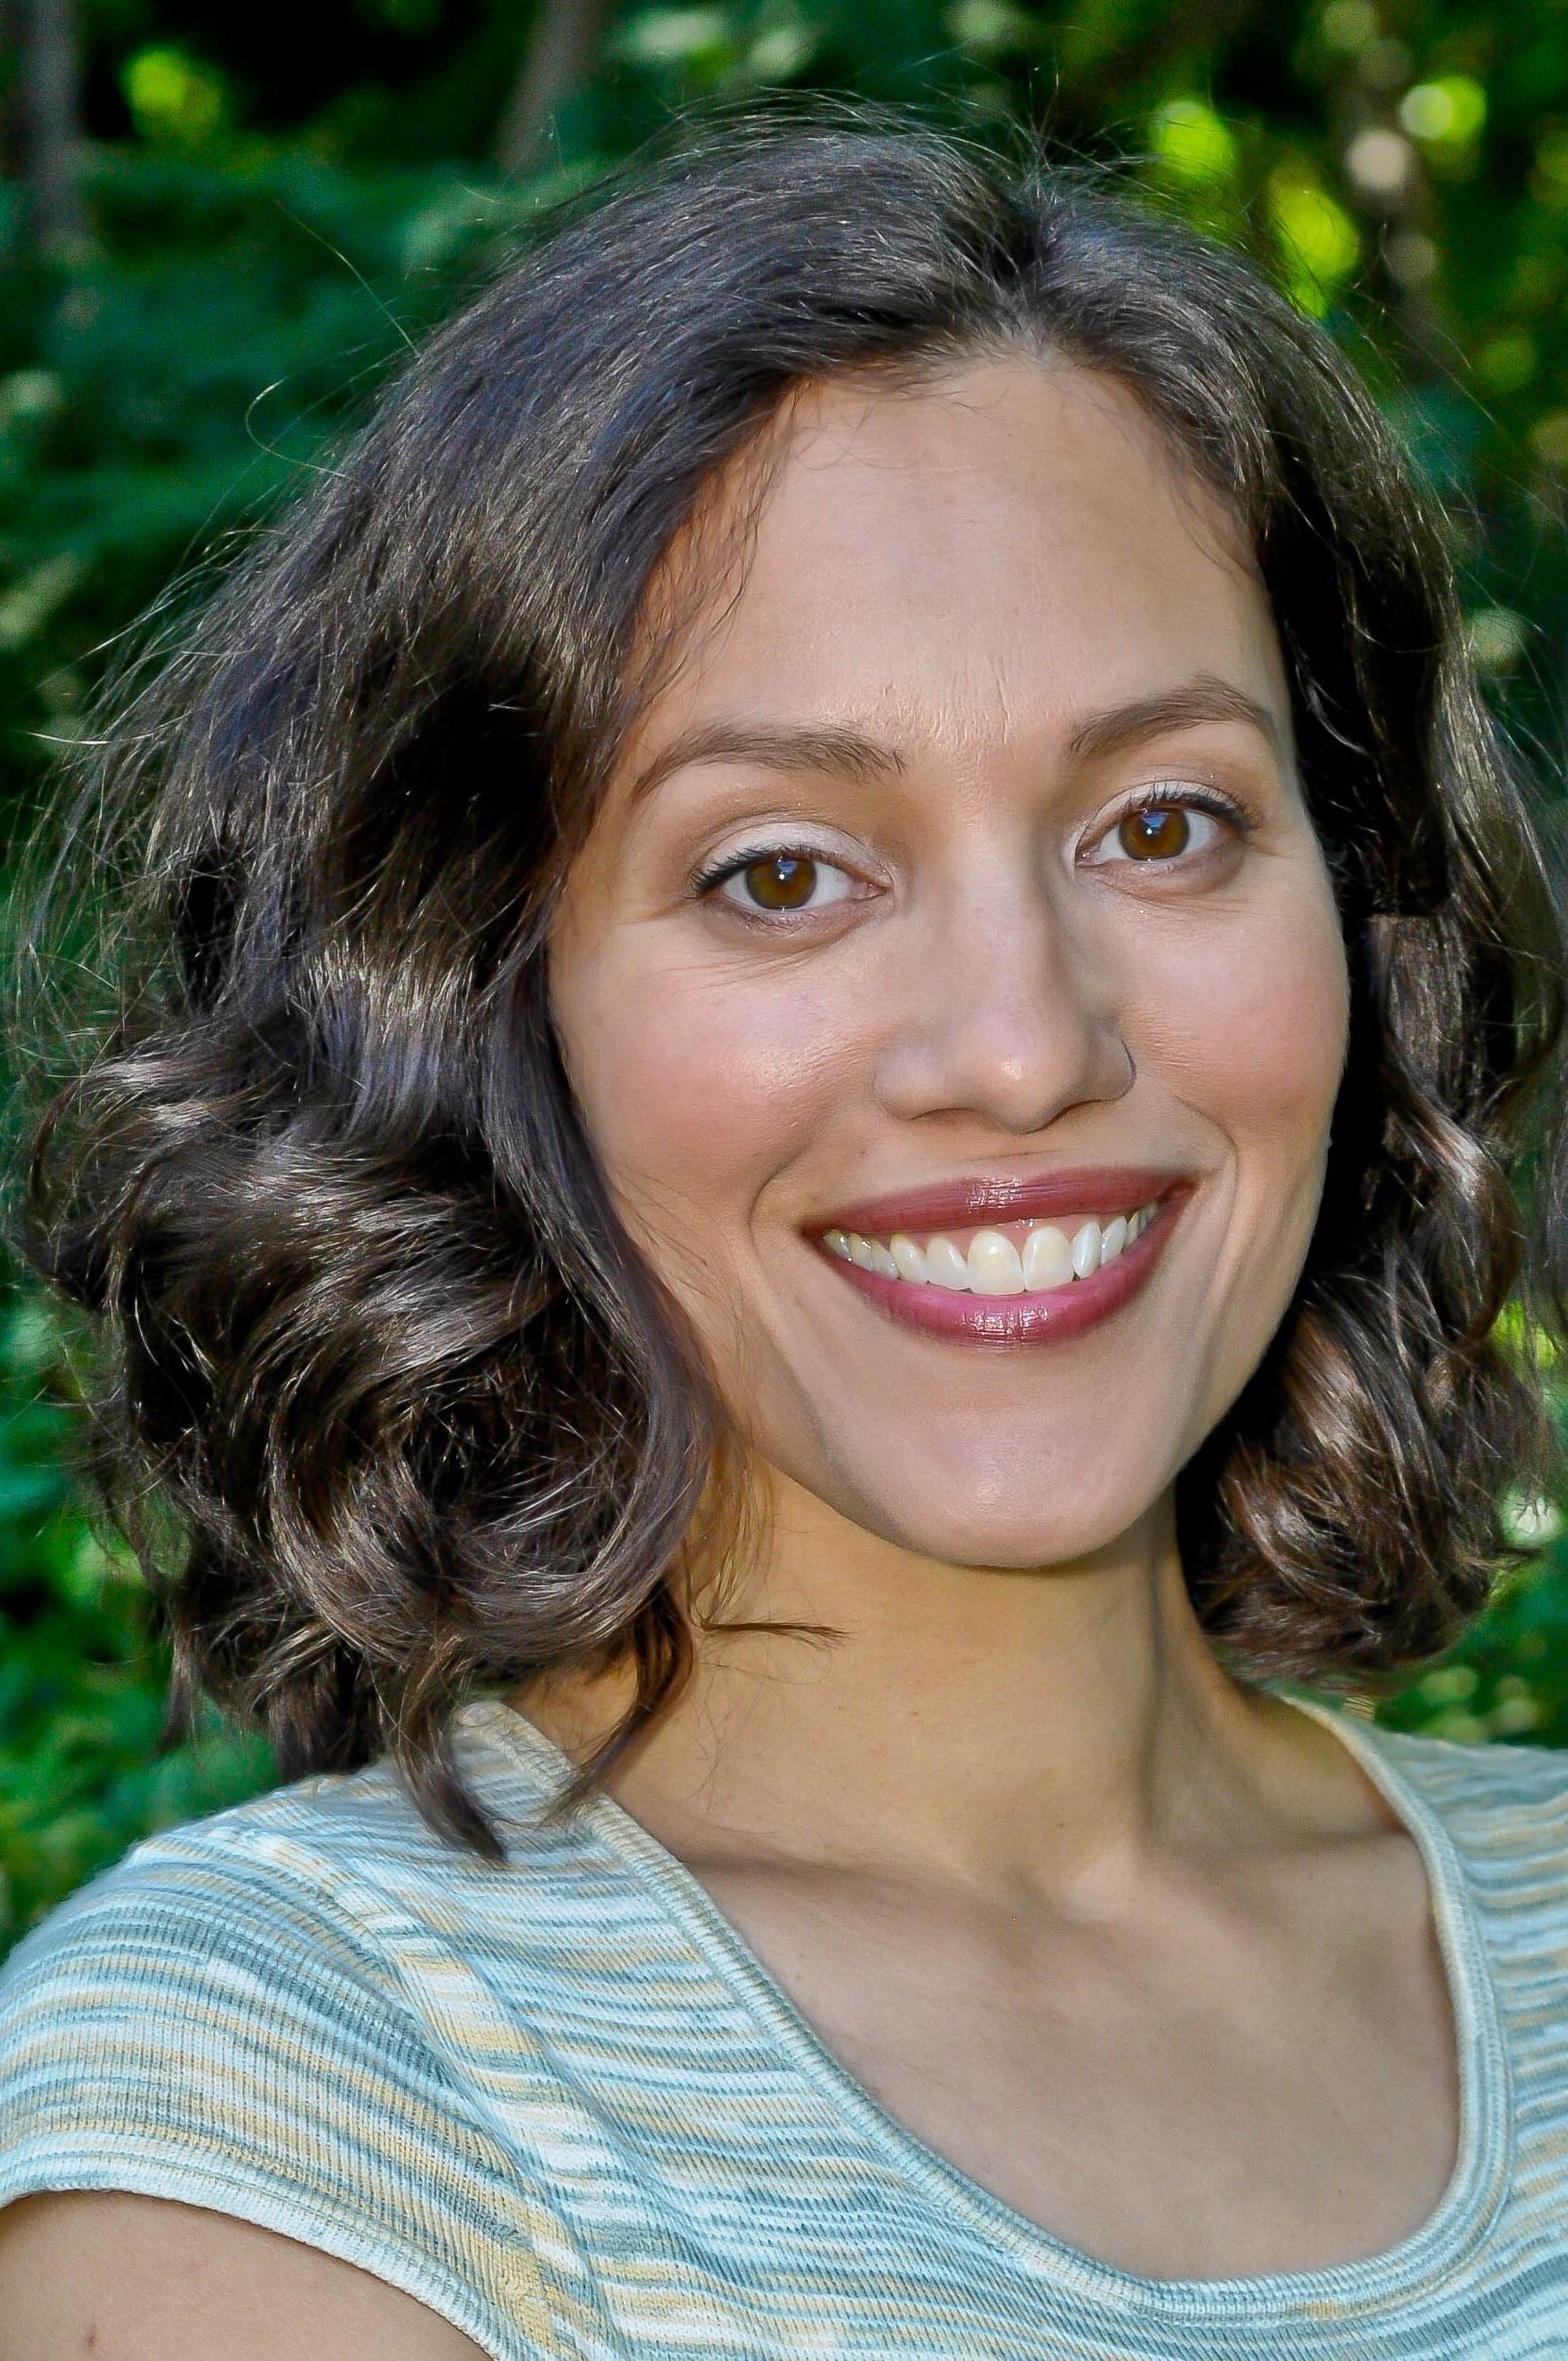 Jessica Galan